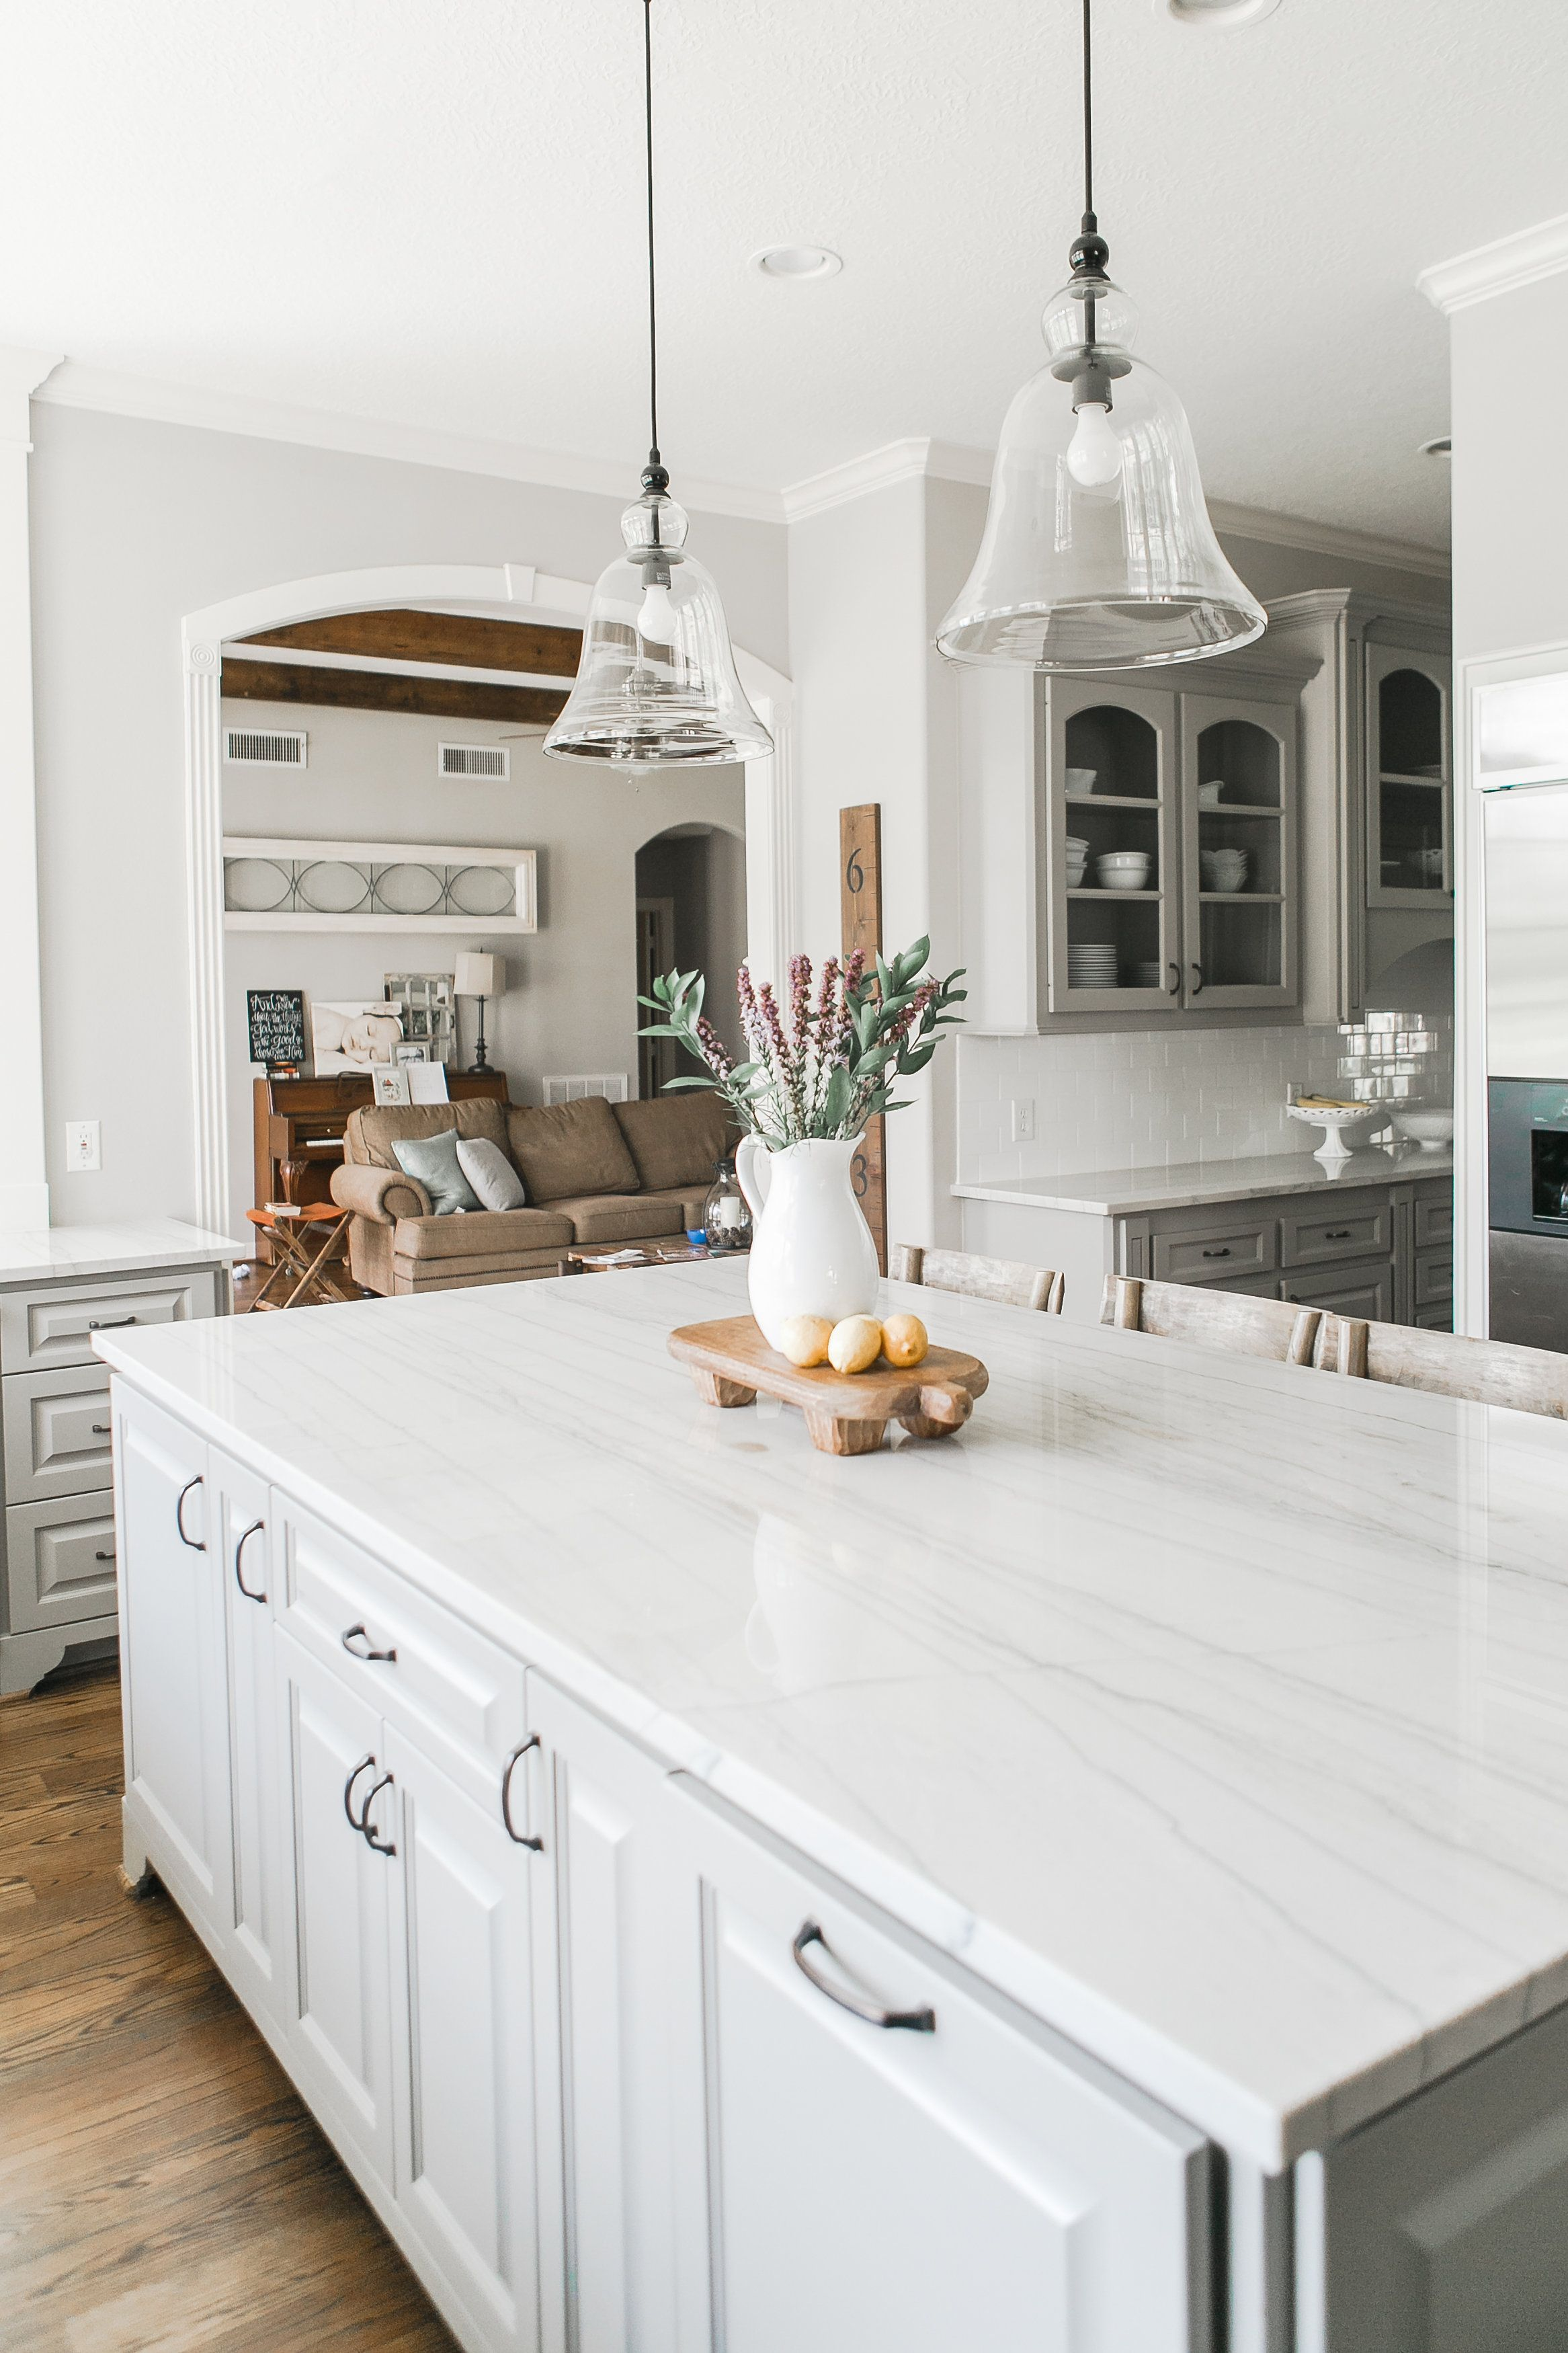 Farmhouse Kitchen | Traditional Kitchen | Gray & White Kitchen ...